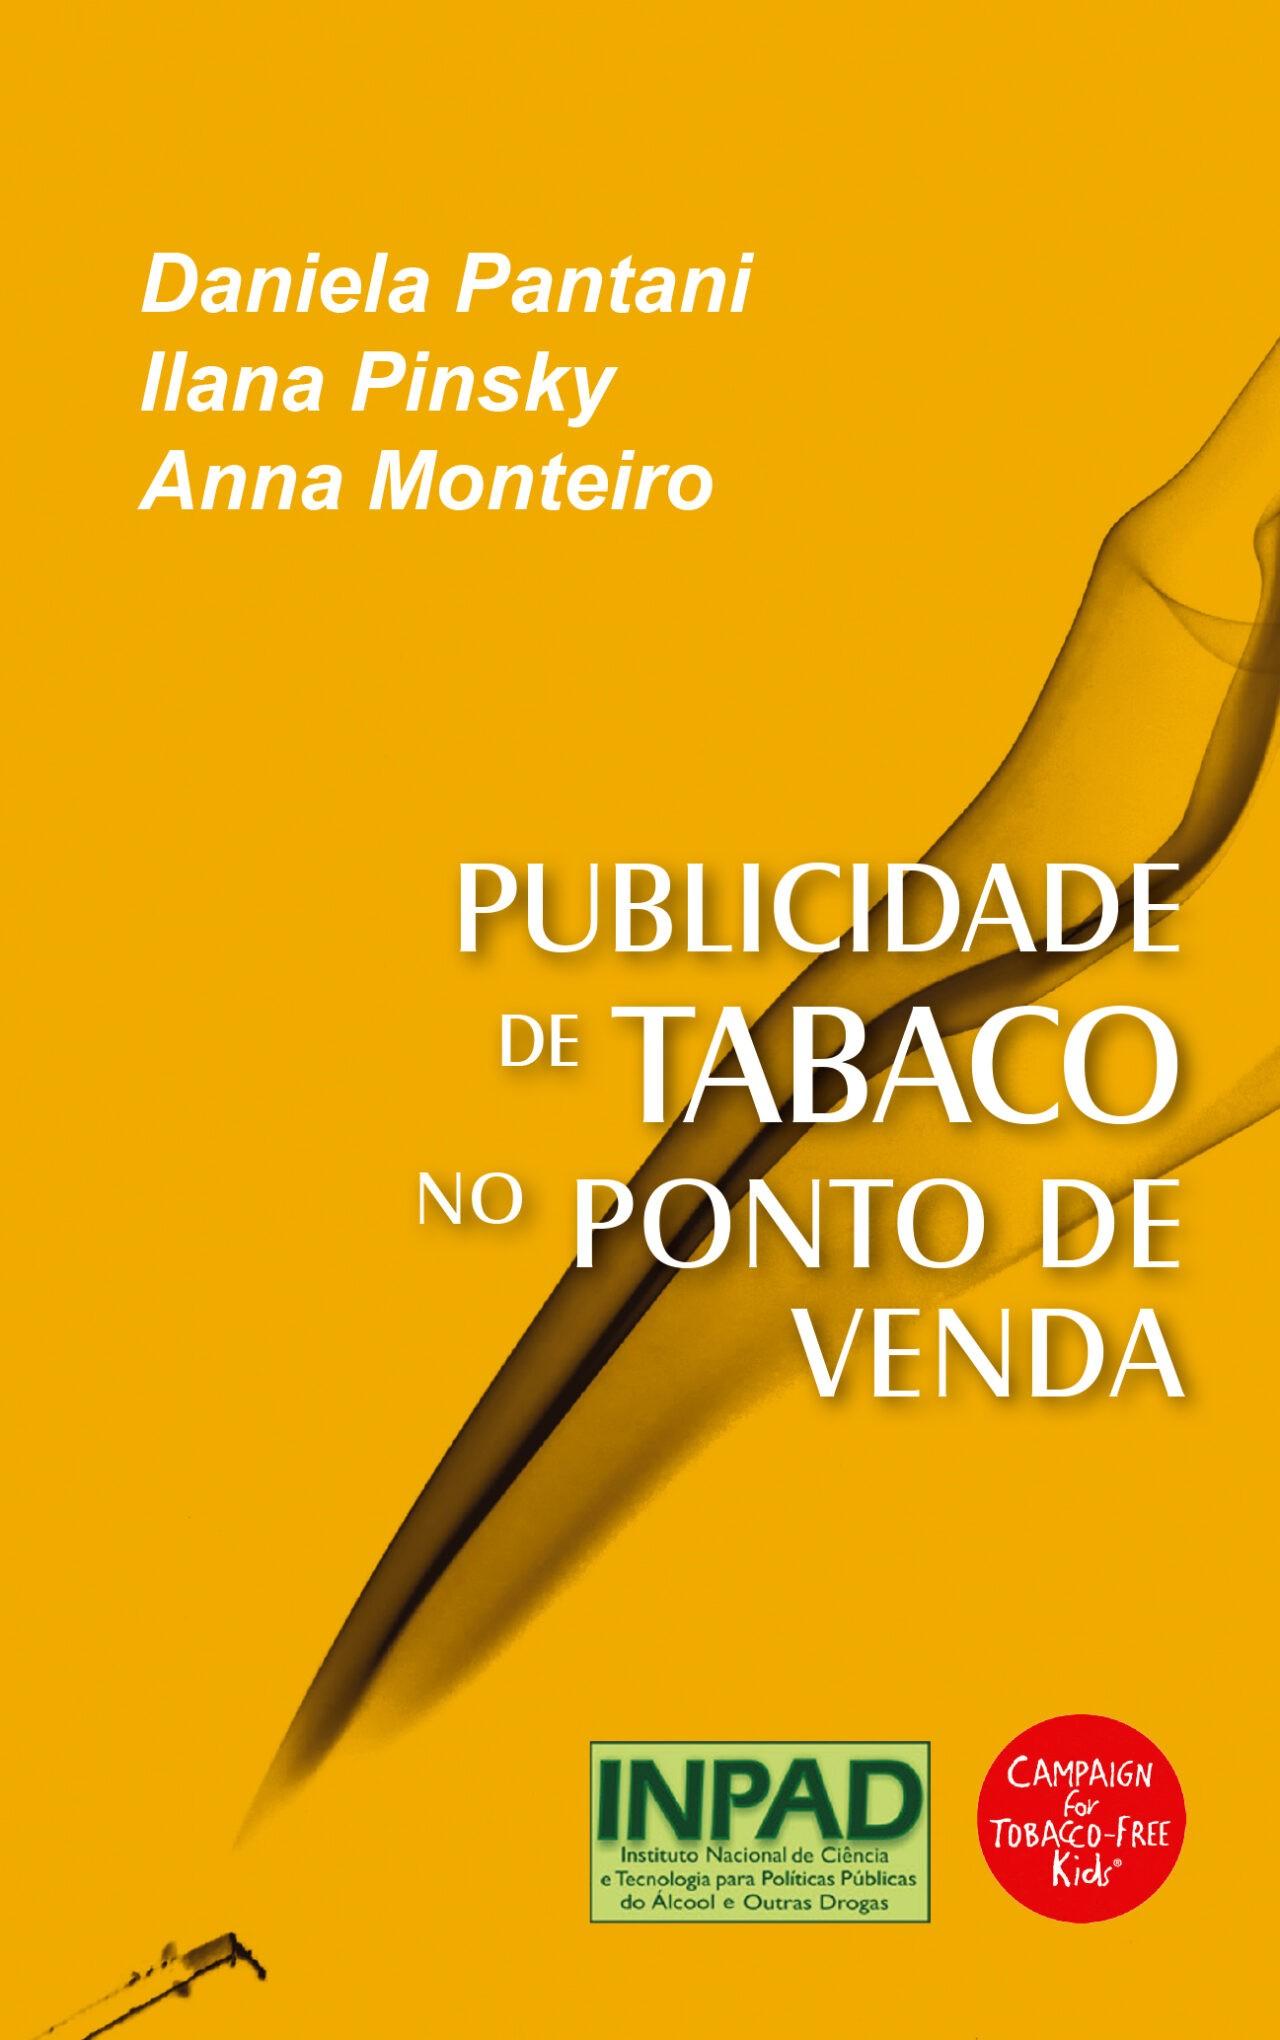 PUBLICIDADE-DE-TABACO-para-dowload-1